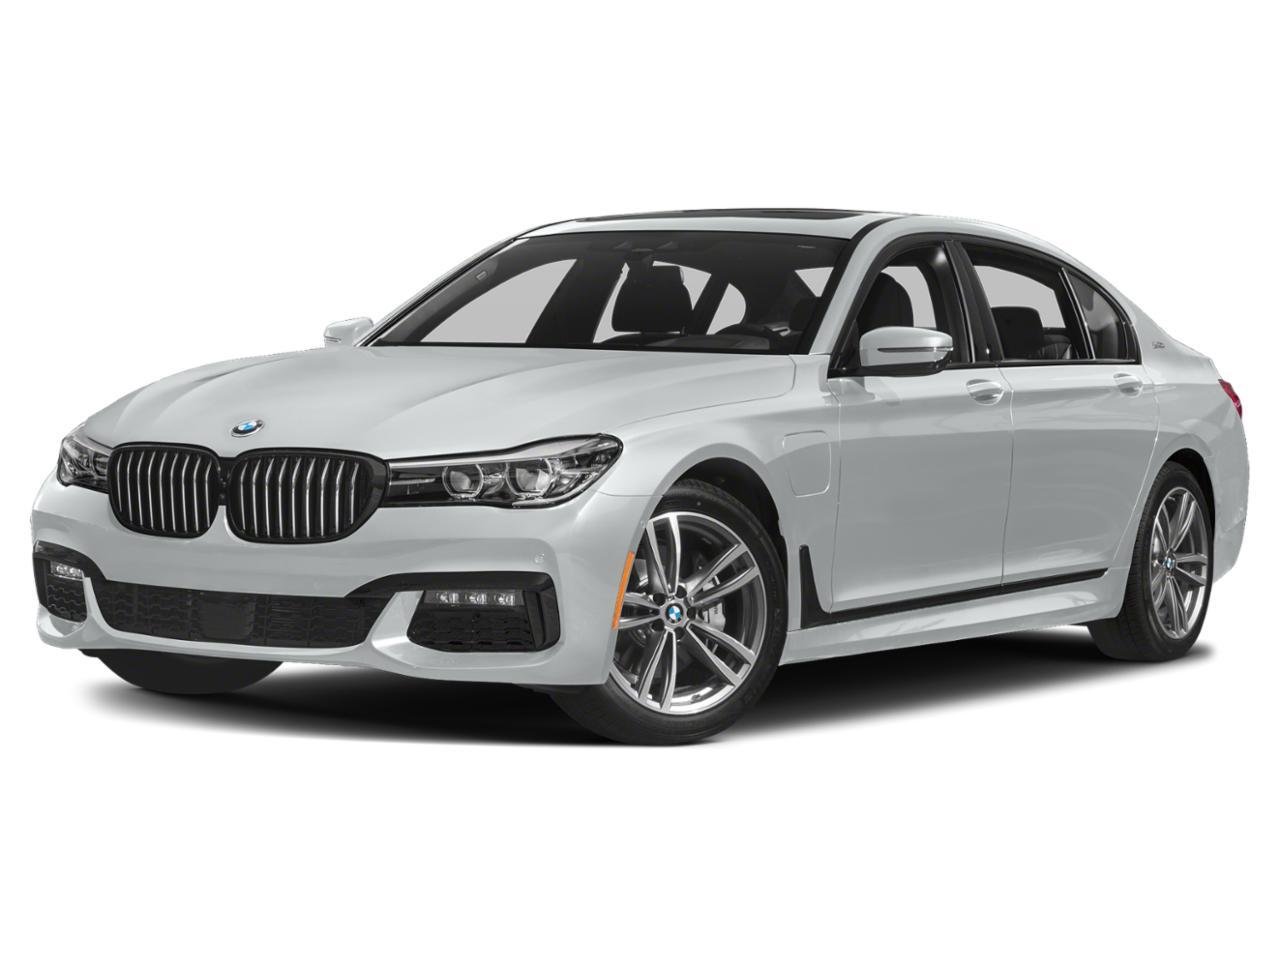 2019 BMW 740e xDrive iPerformance Vehicle Photo in Pleasanton, CA 94588